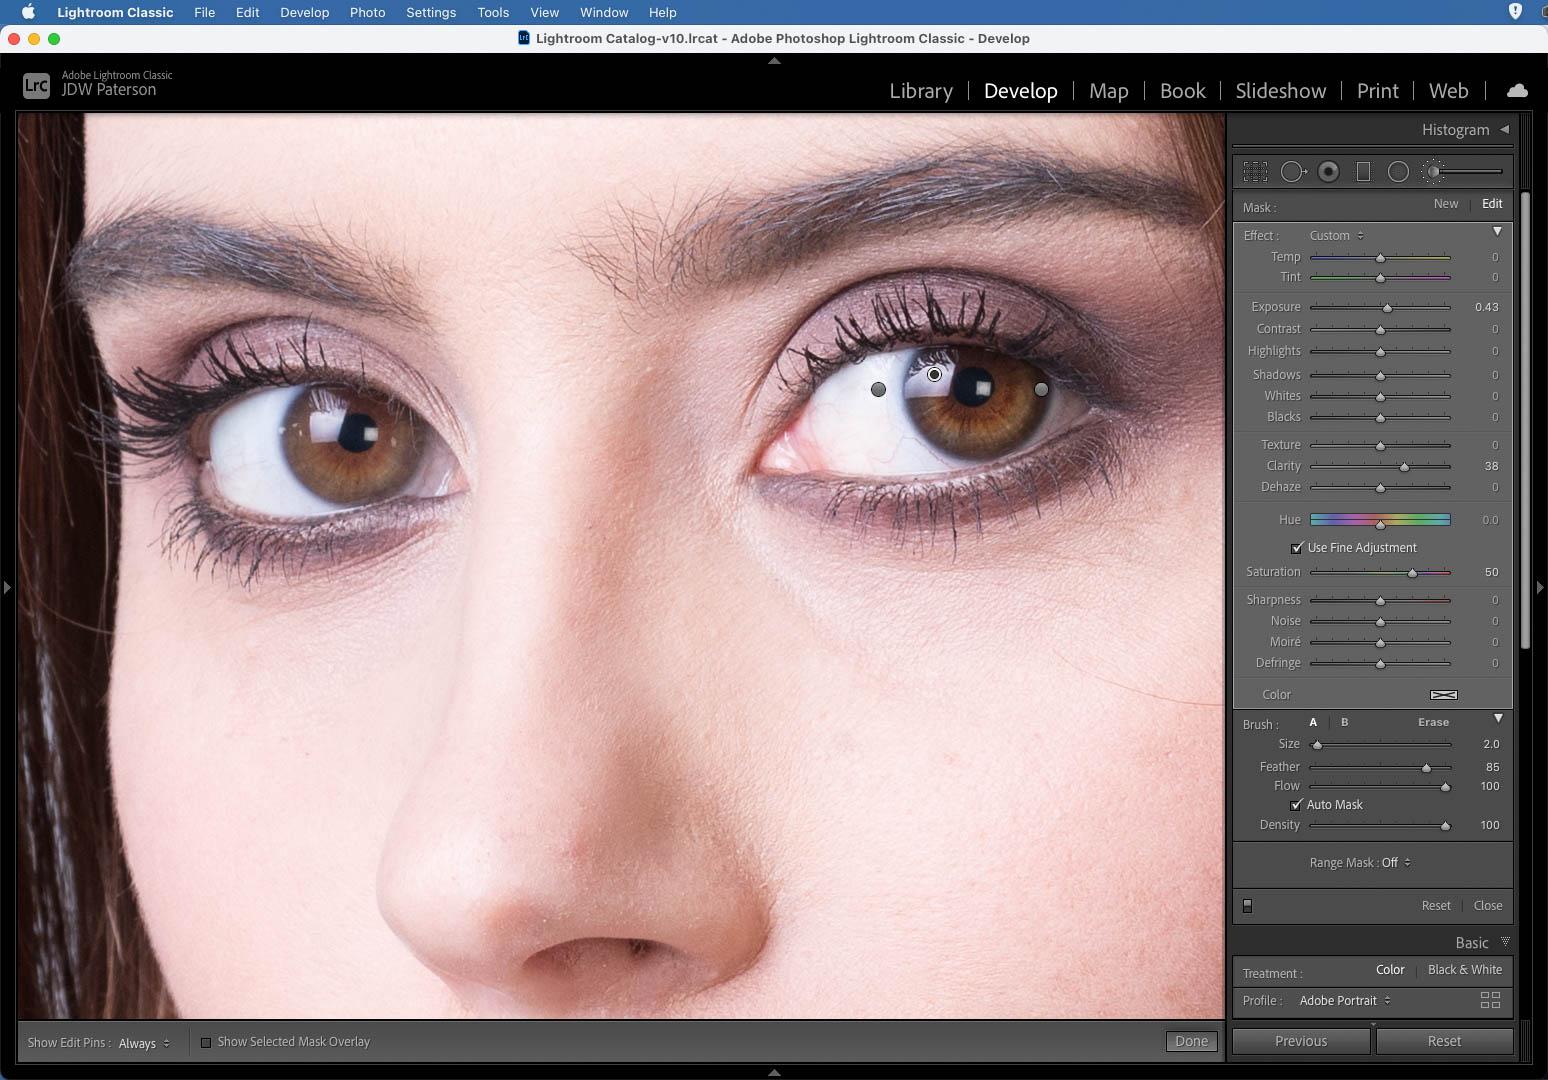 Using the Adjustment Brush in Adobe Lightroom